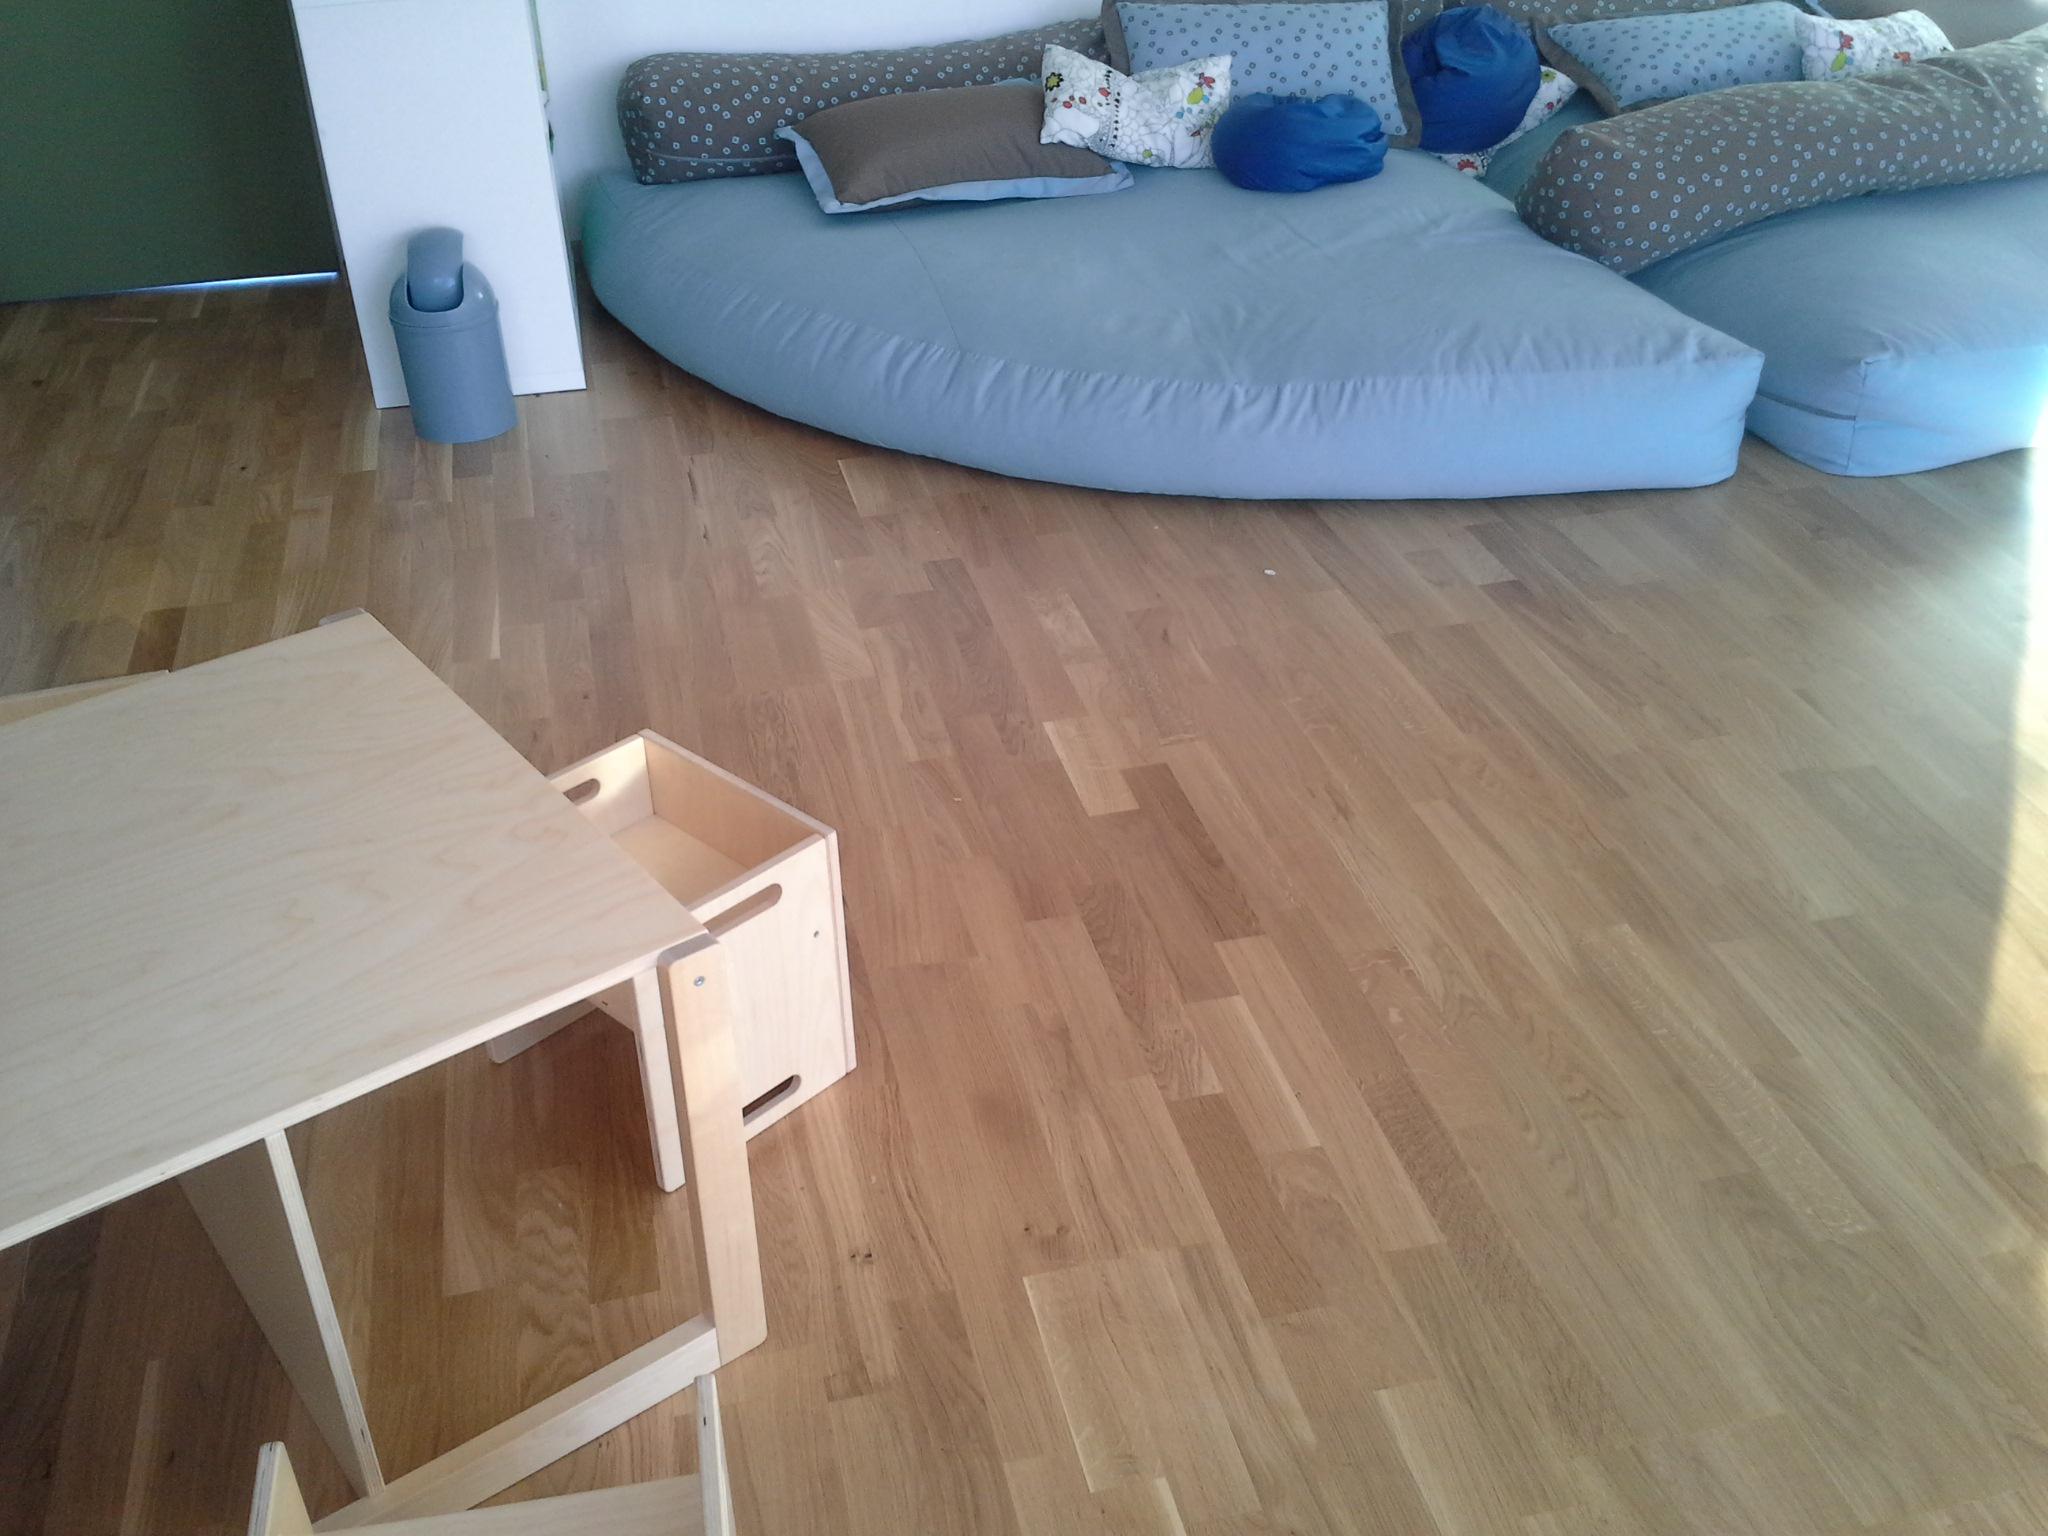 tenhumberg in greven laminat parkett zu g nstigen preisen fertigparkett eiche schiffsboden. Black Bedroom Furniture Sets. Home Design Ideas